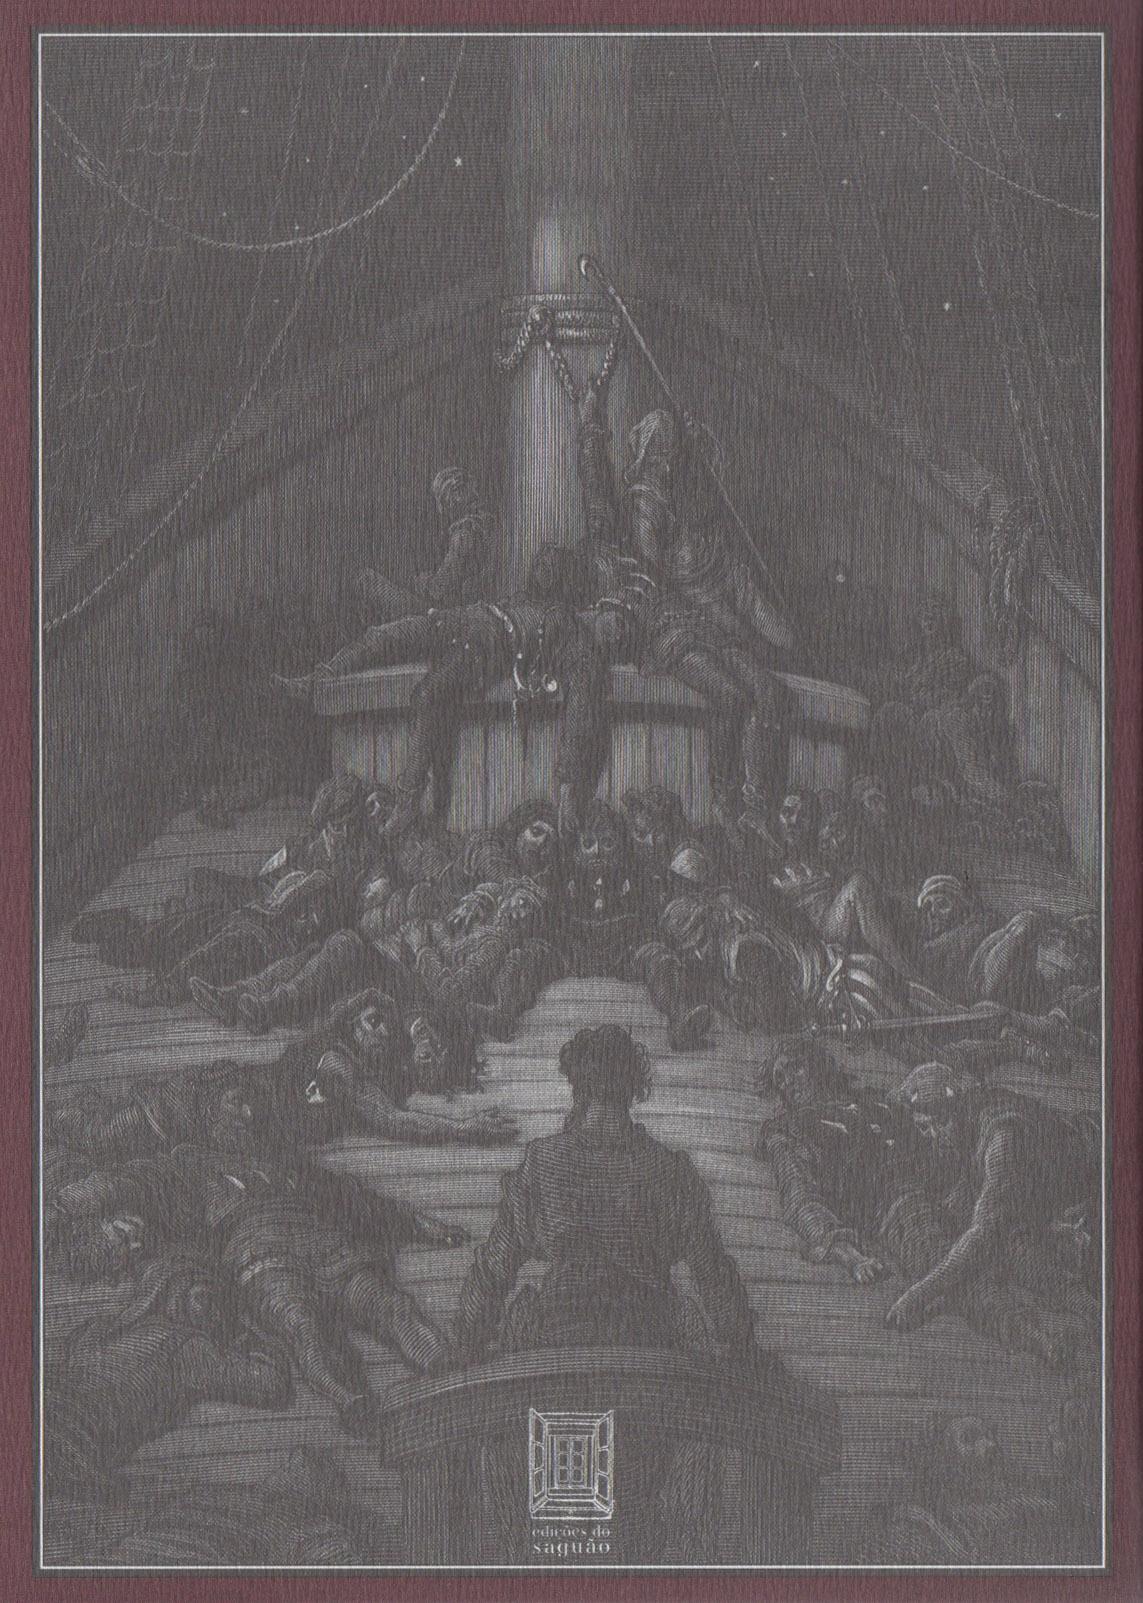 A Balada do Velho Marinheiro, S. T. Coleridge